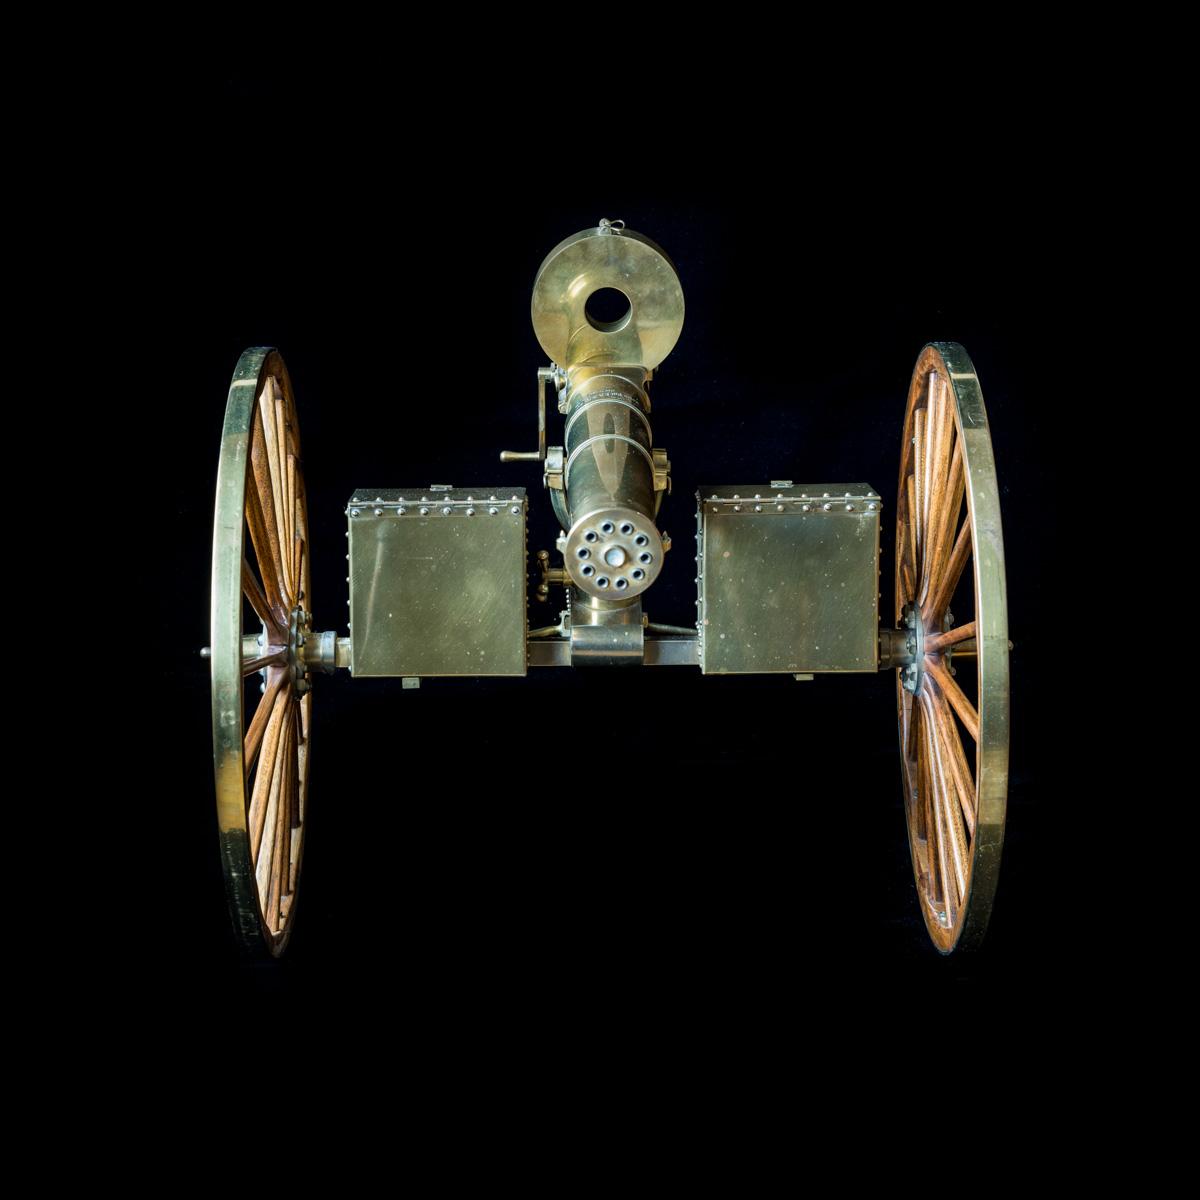 Gatling Gun 1-3rd size model-8